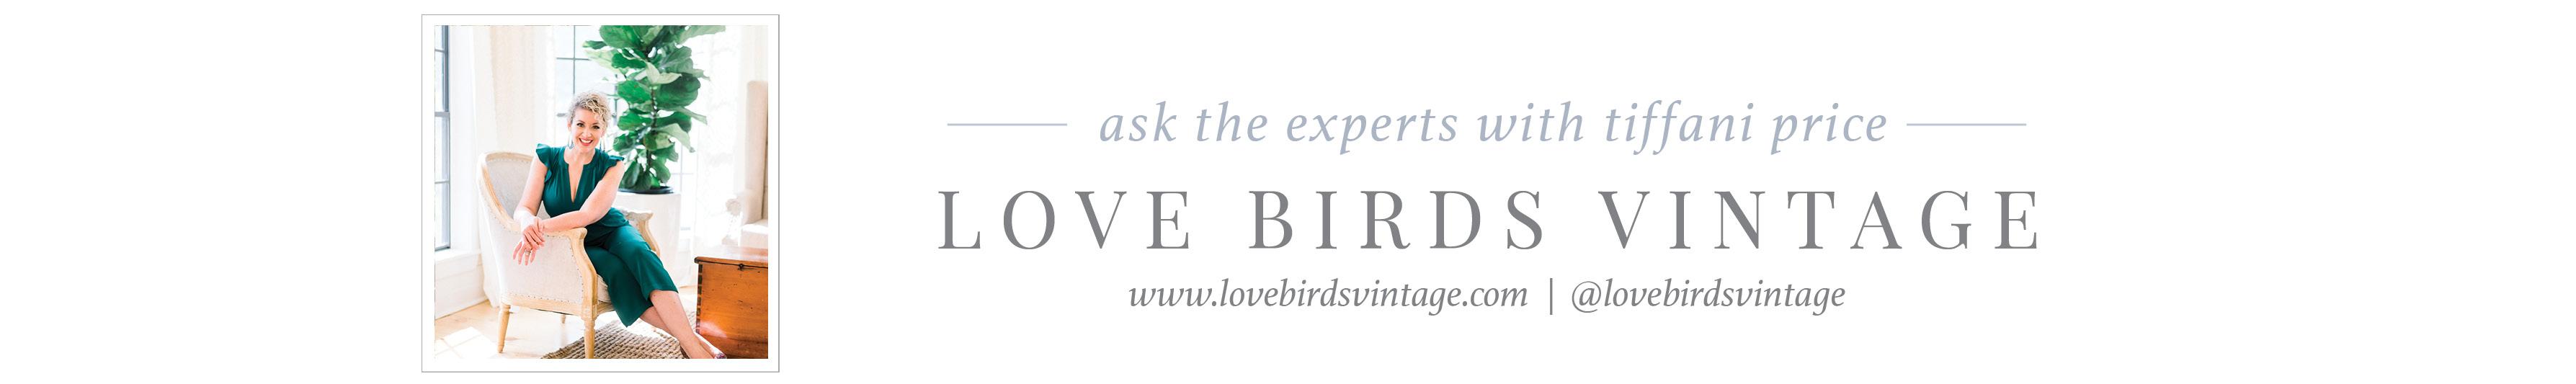 love birds vintage